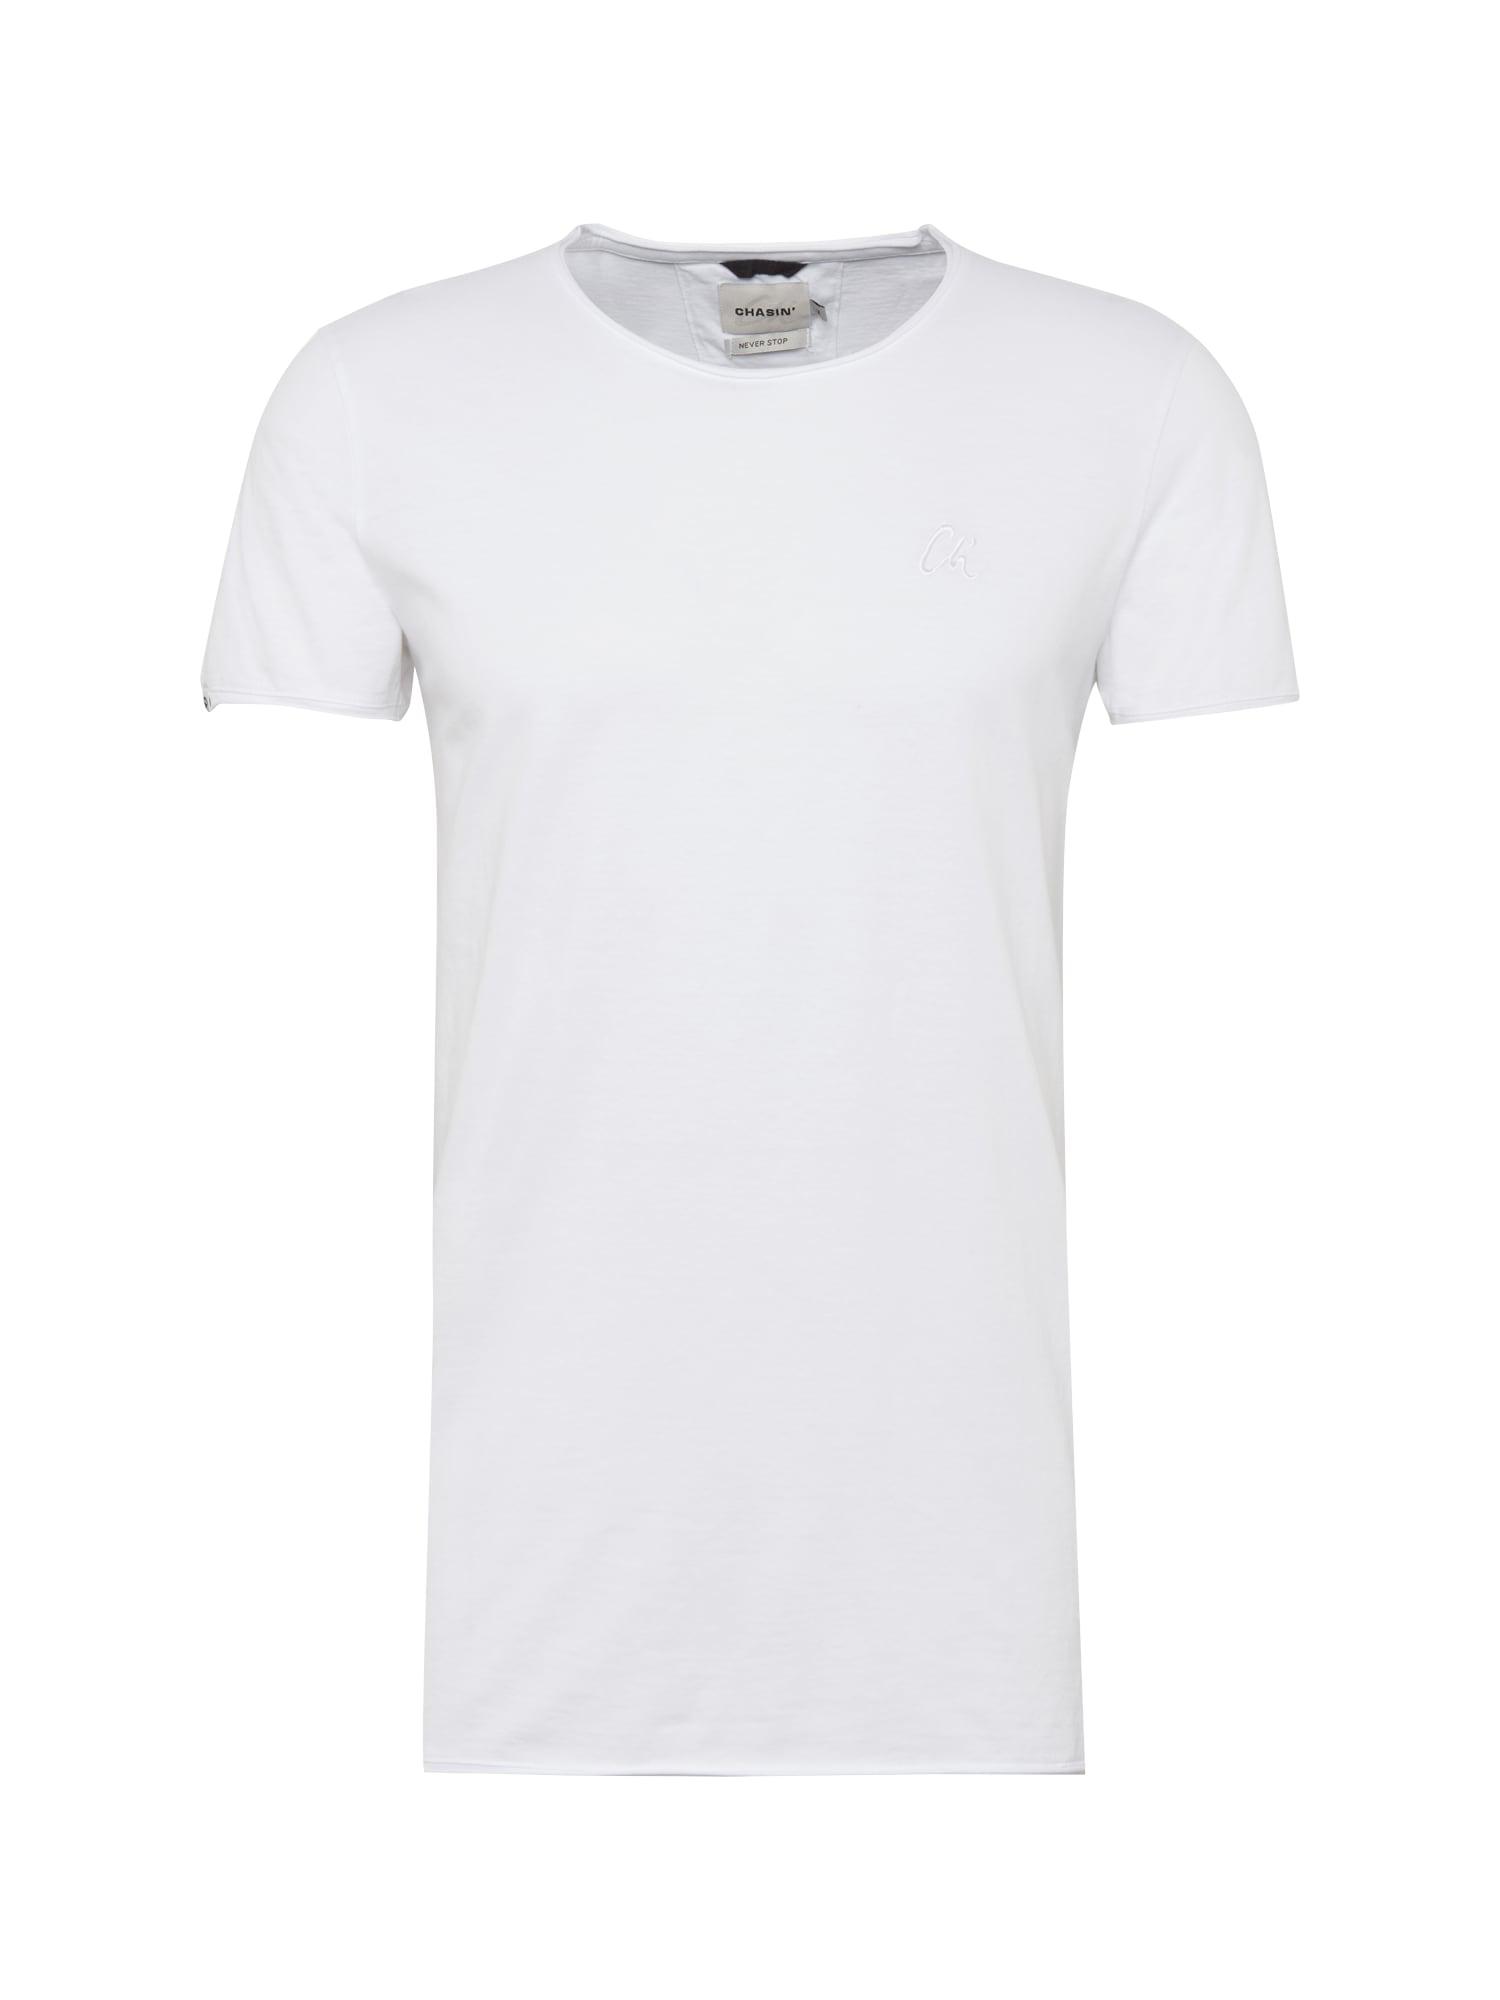 CHASIN Tričko EXPAND bílá CHASIN'